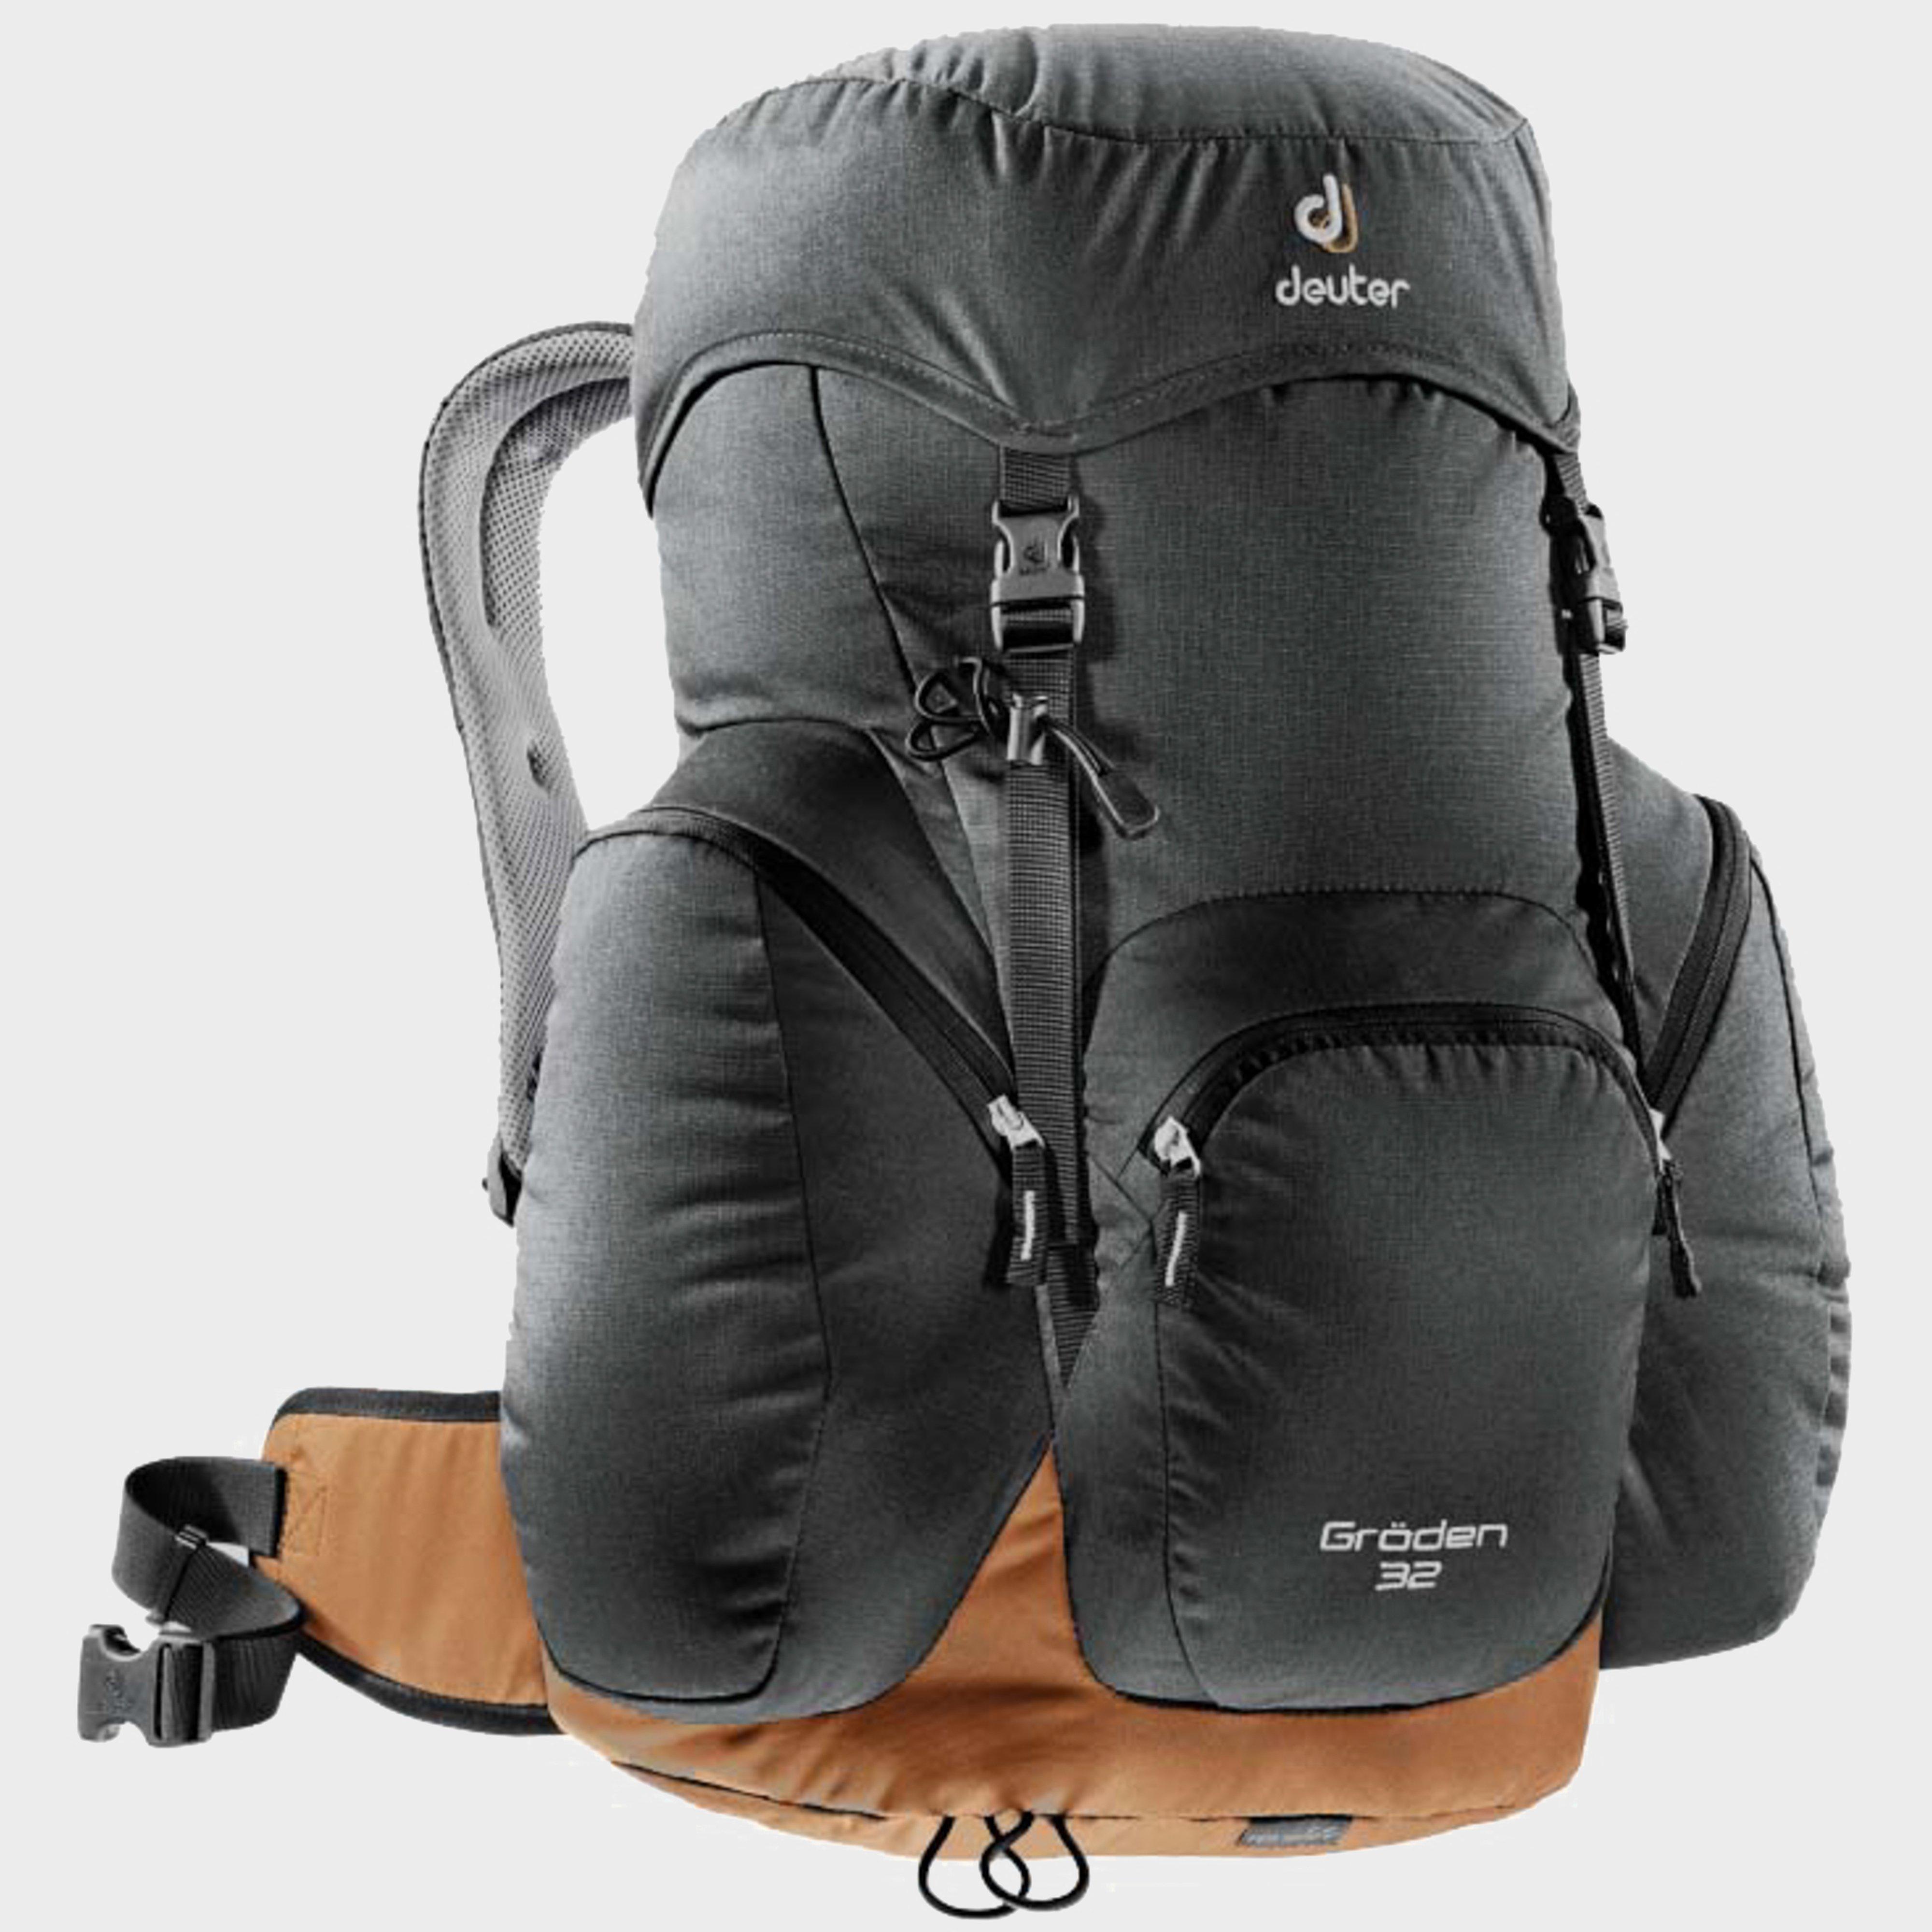 Deuter Deuter Groden 32 Rucksack - Black, Black